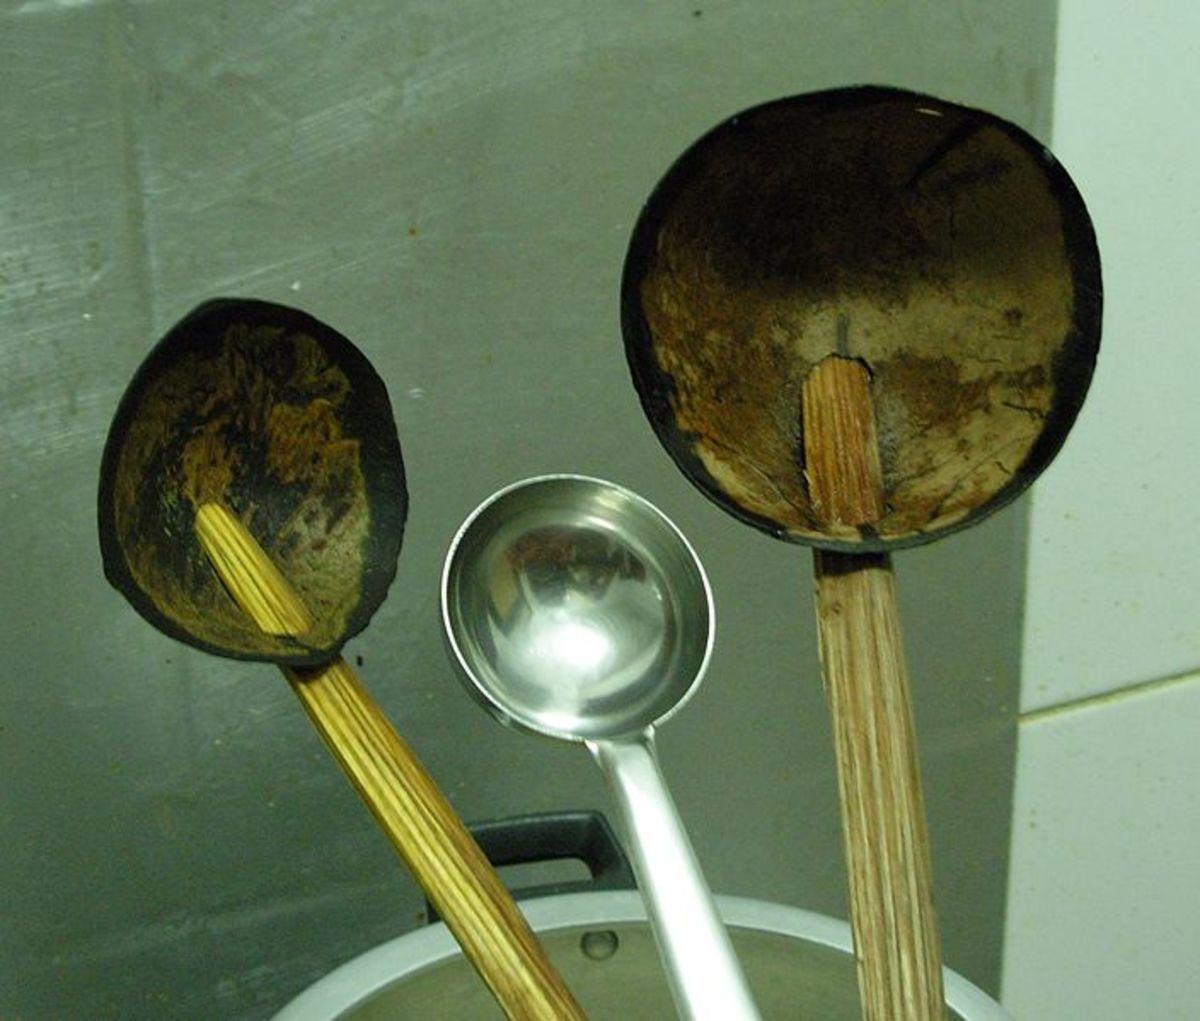 coconut spoons